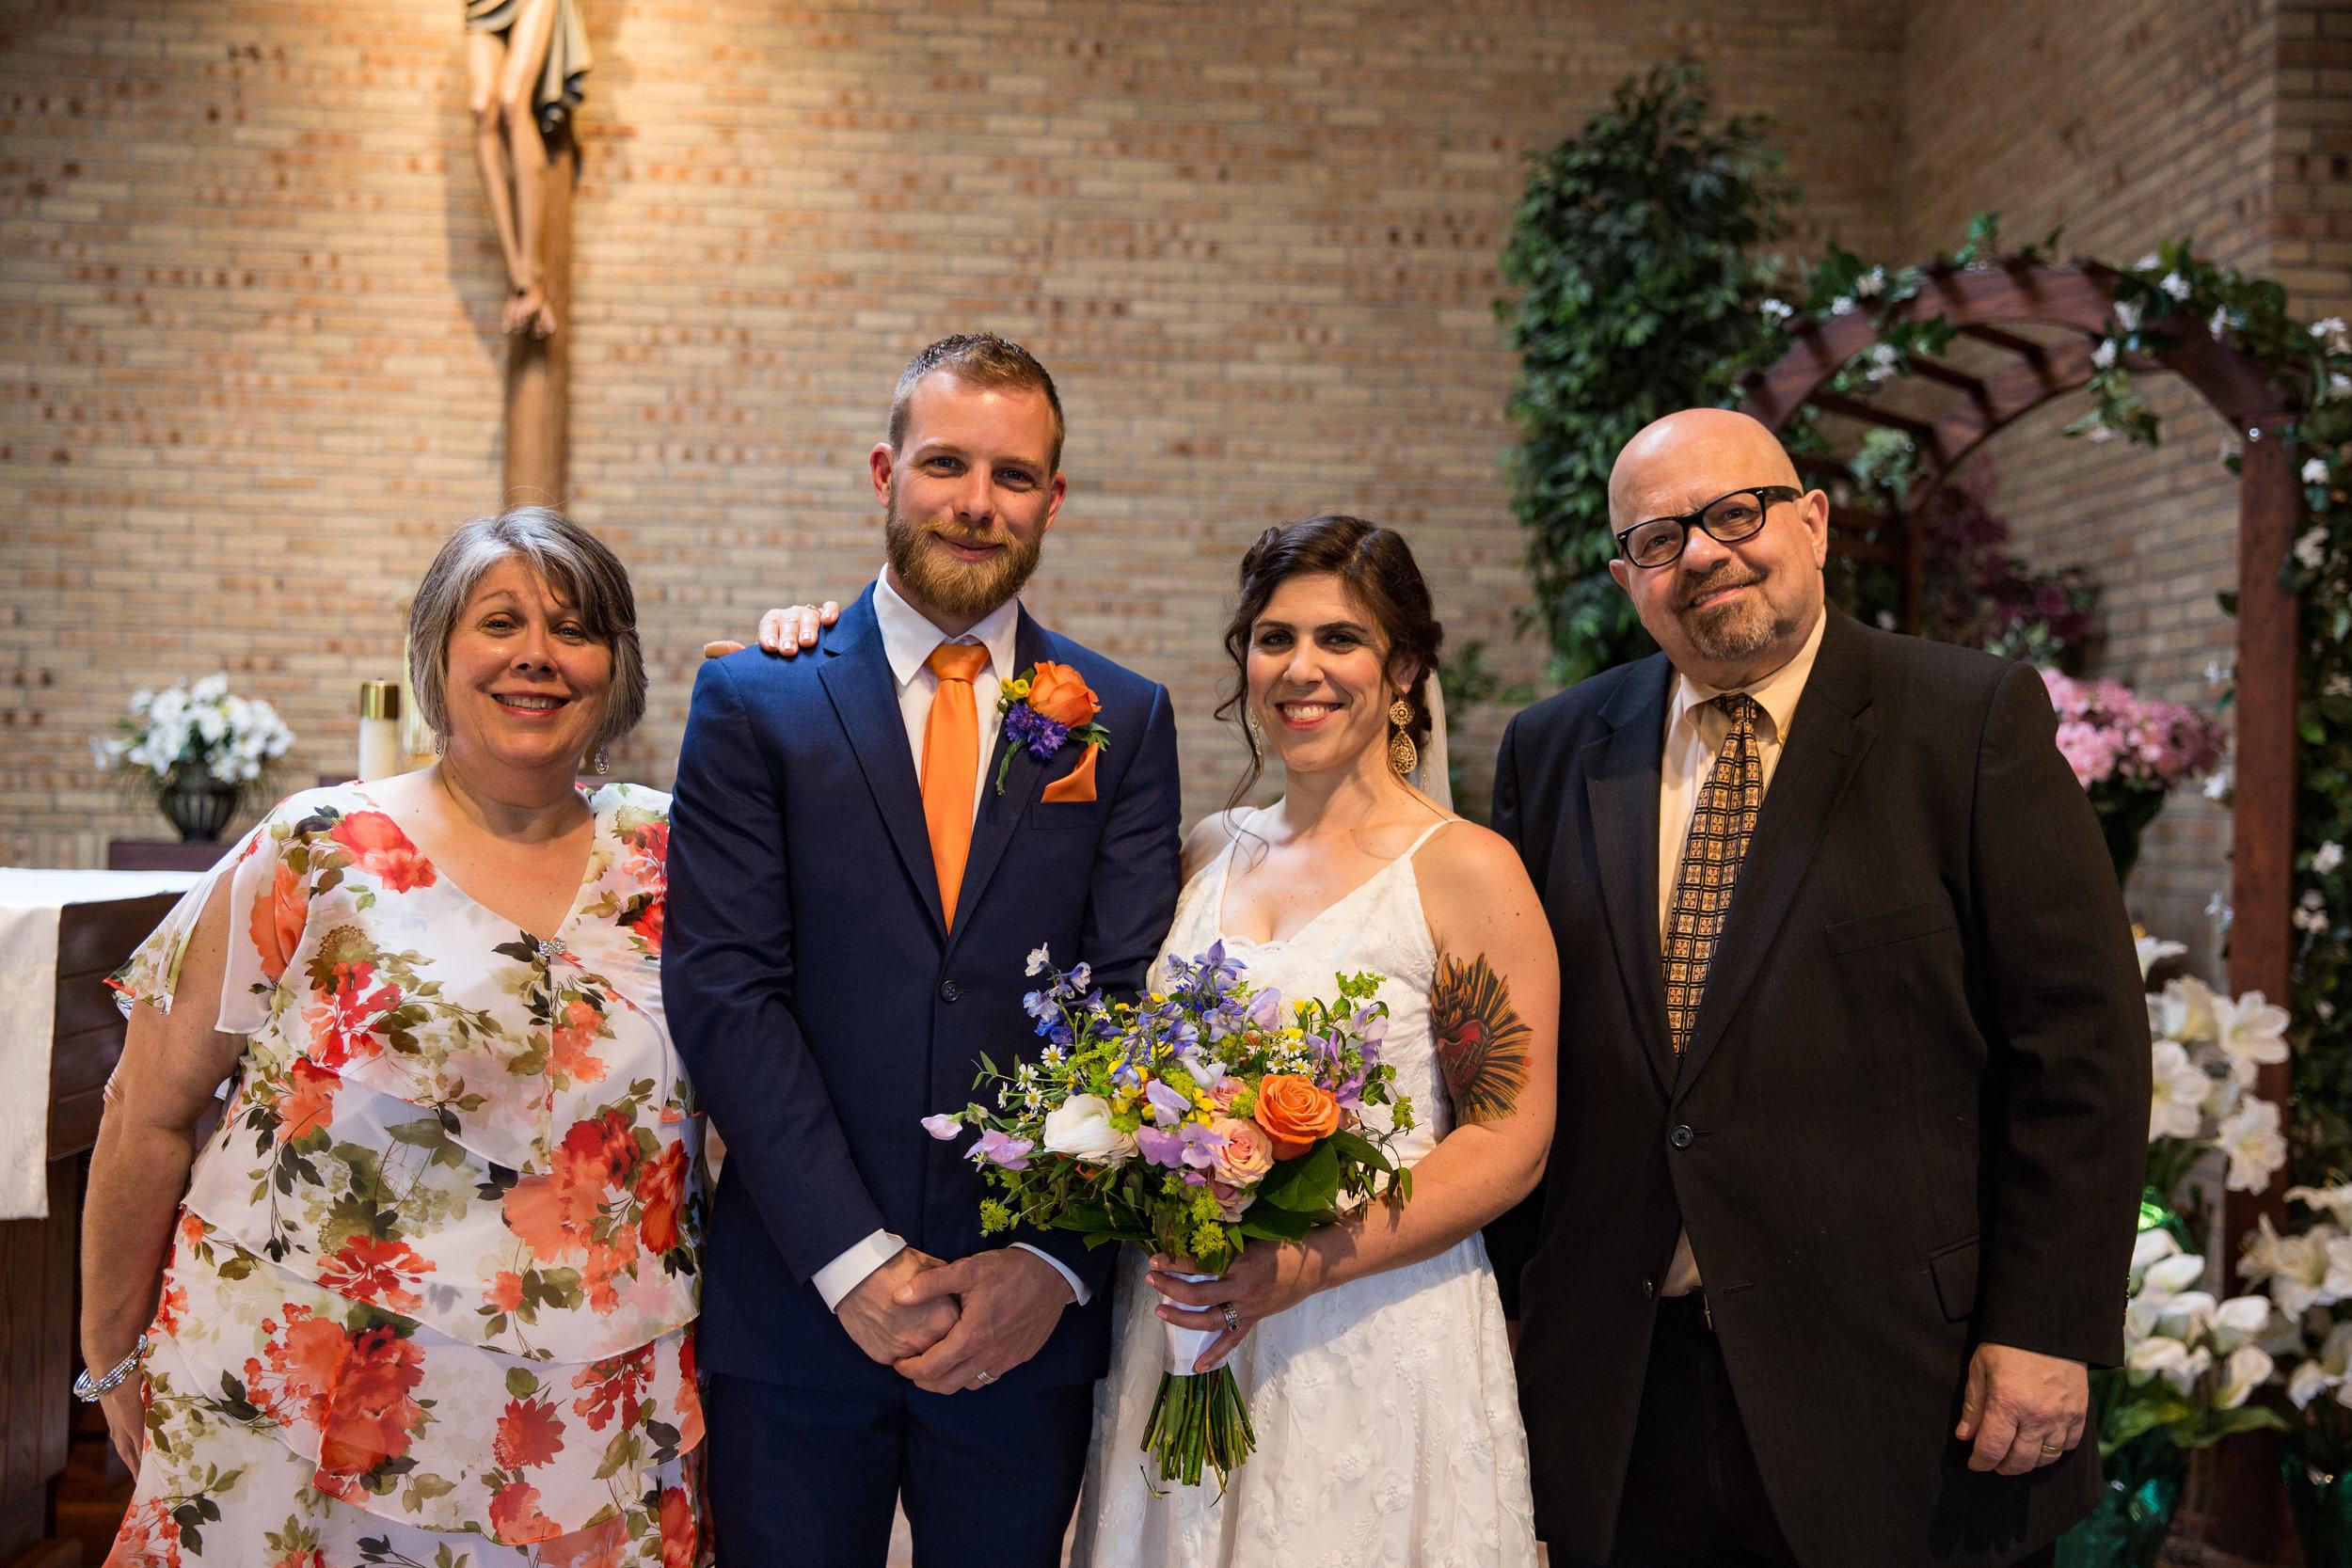 Natalie and Dallas Mooney Wedding 6-8-19_Tania Watt Photography-196.jpg